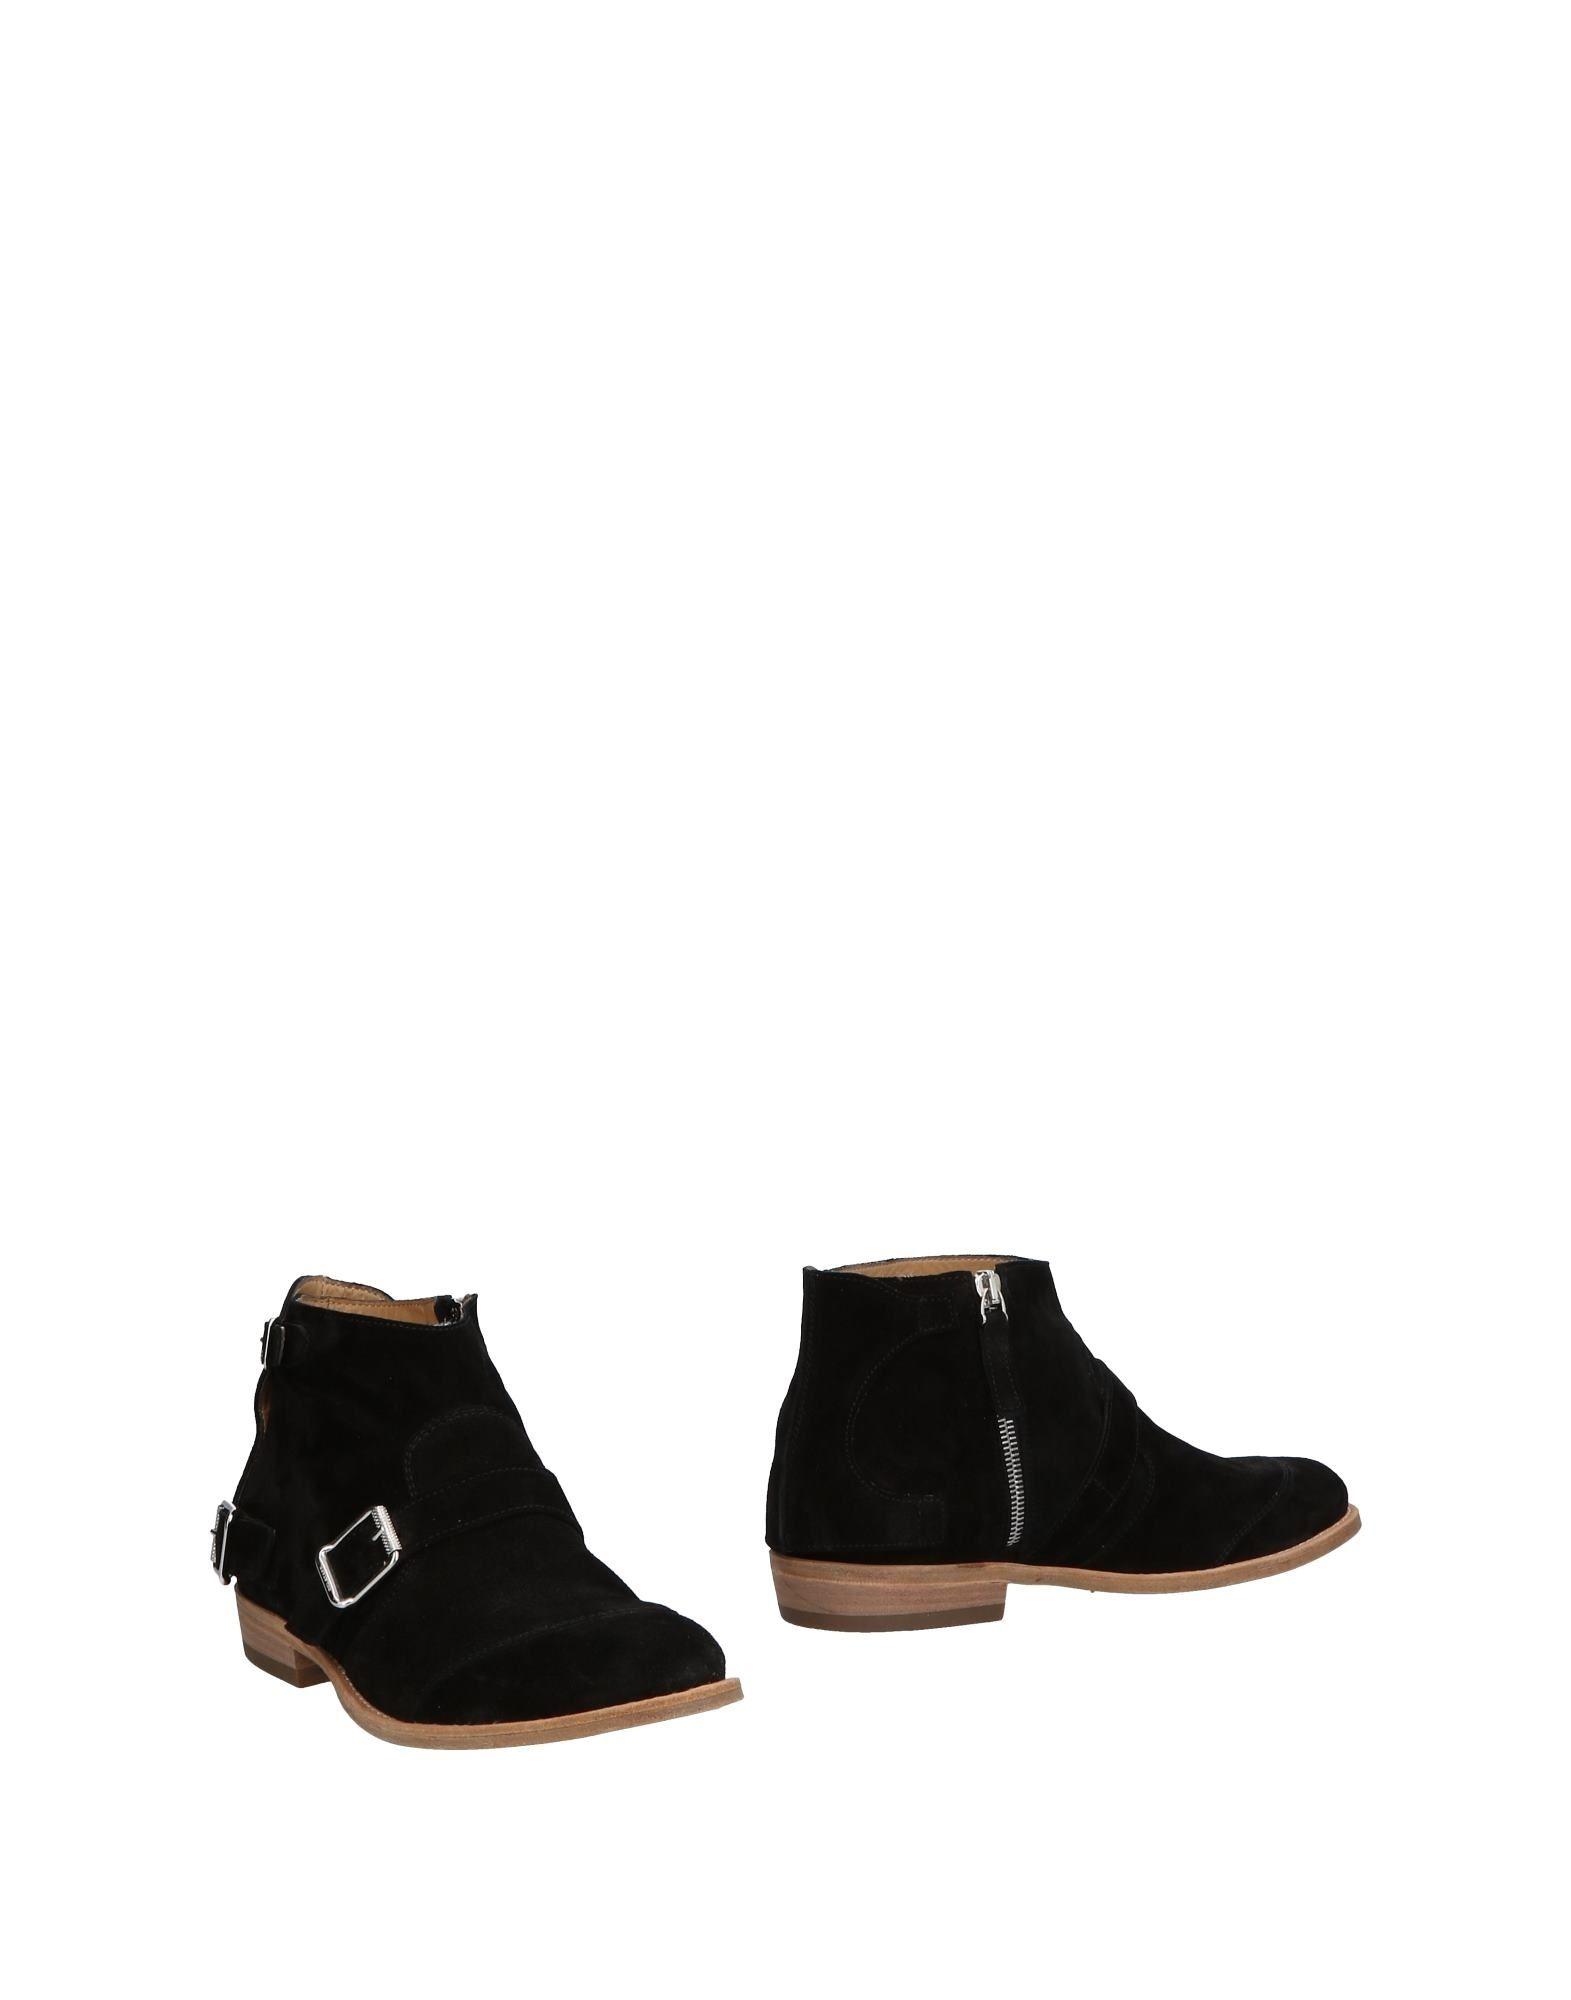 Rabatt Schuhe Belstaff Stiefelette Damen  11396333EI